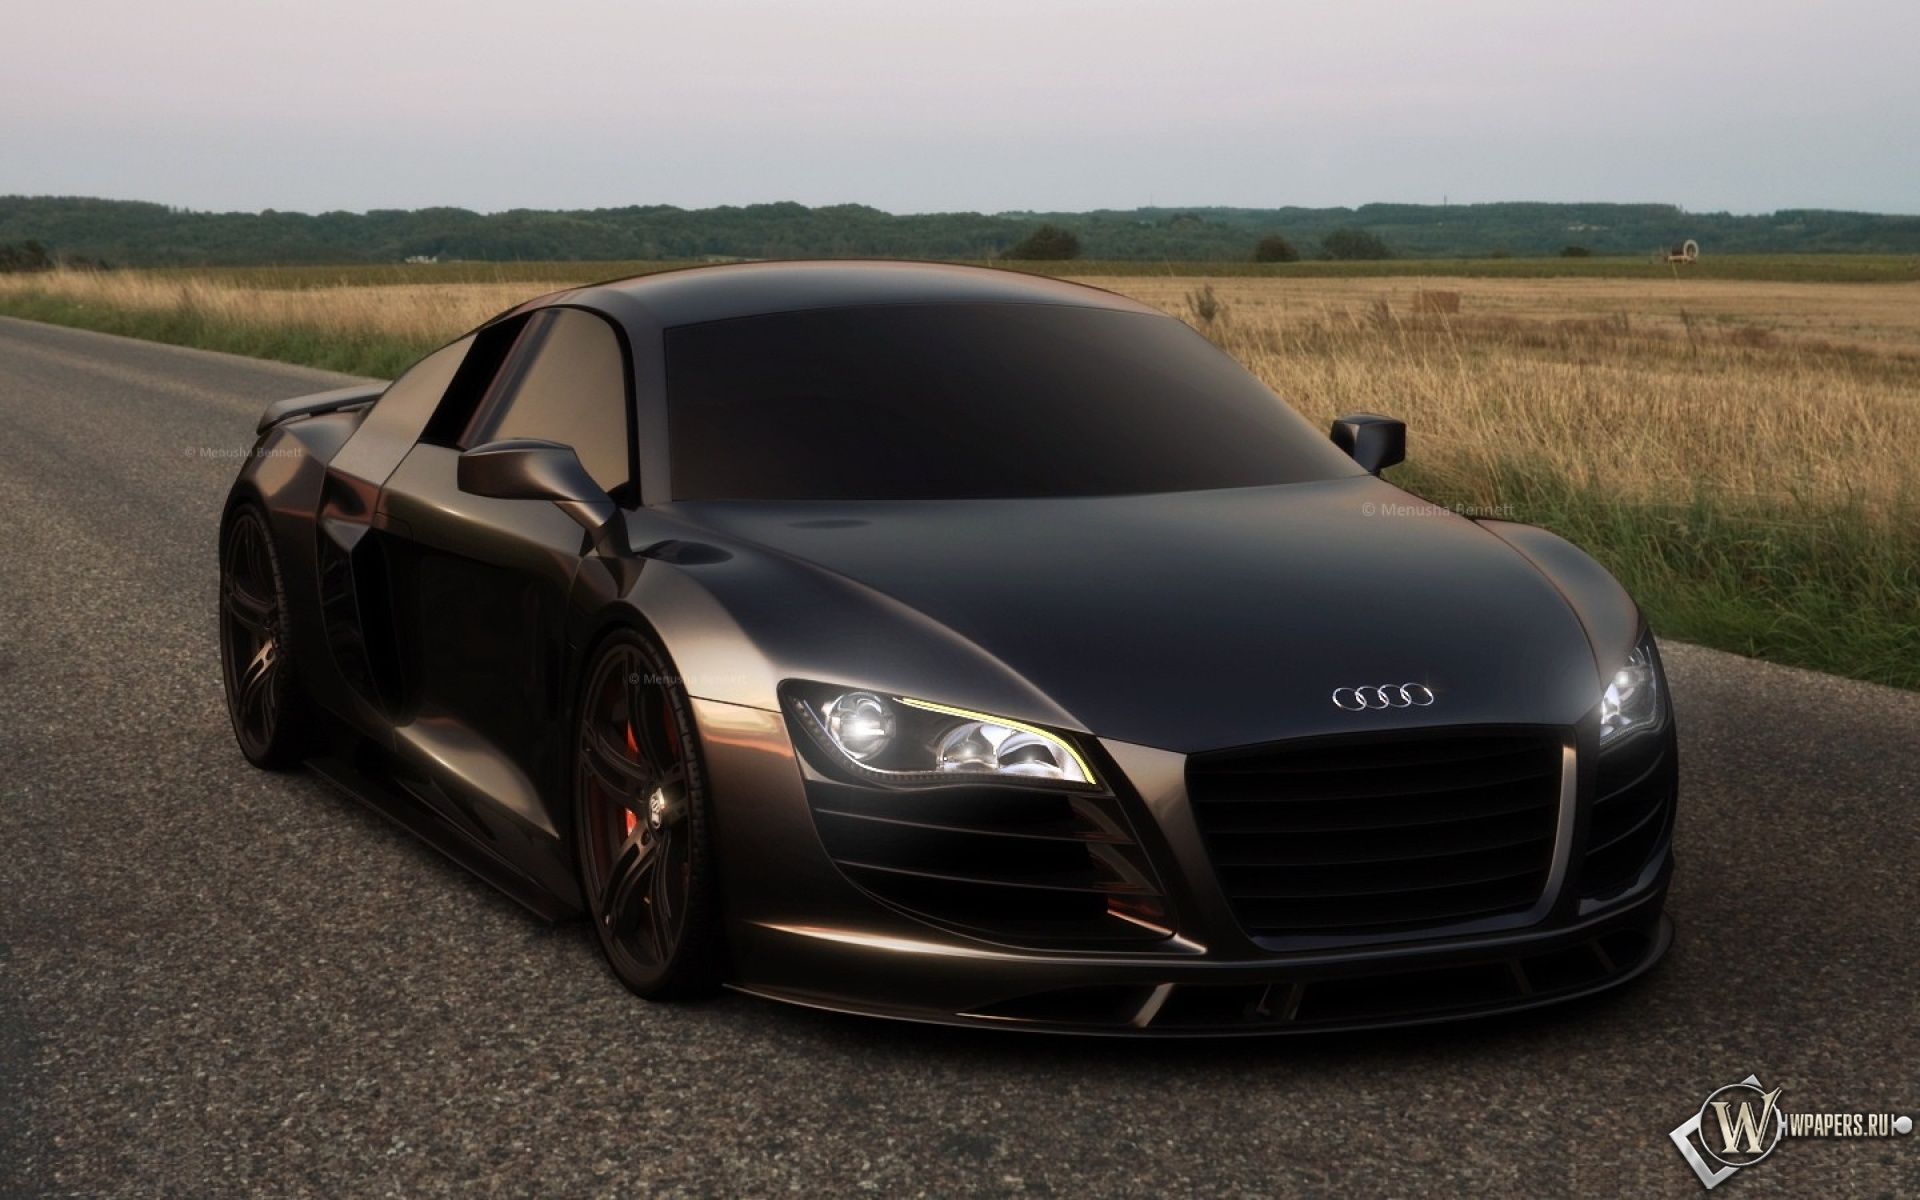 Matte Black Wallpaper Google Search Luxury Cars Black Audi